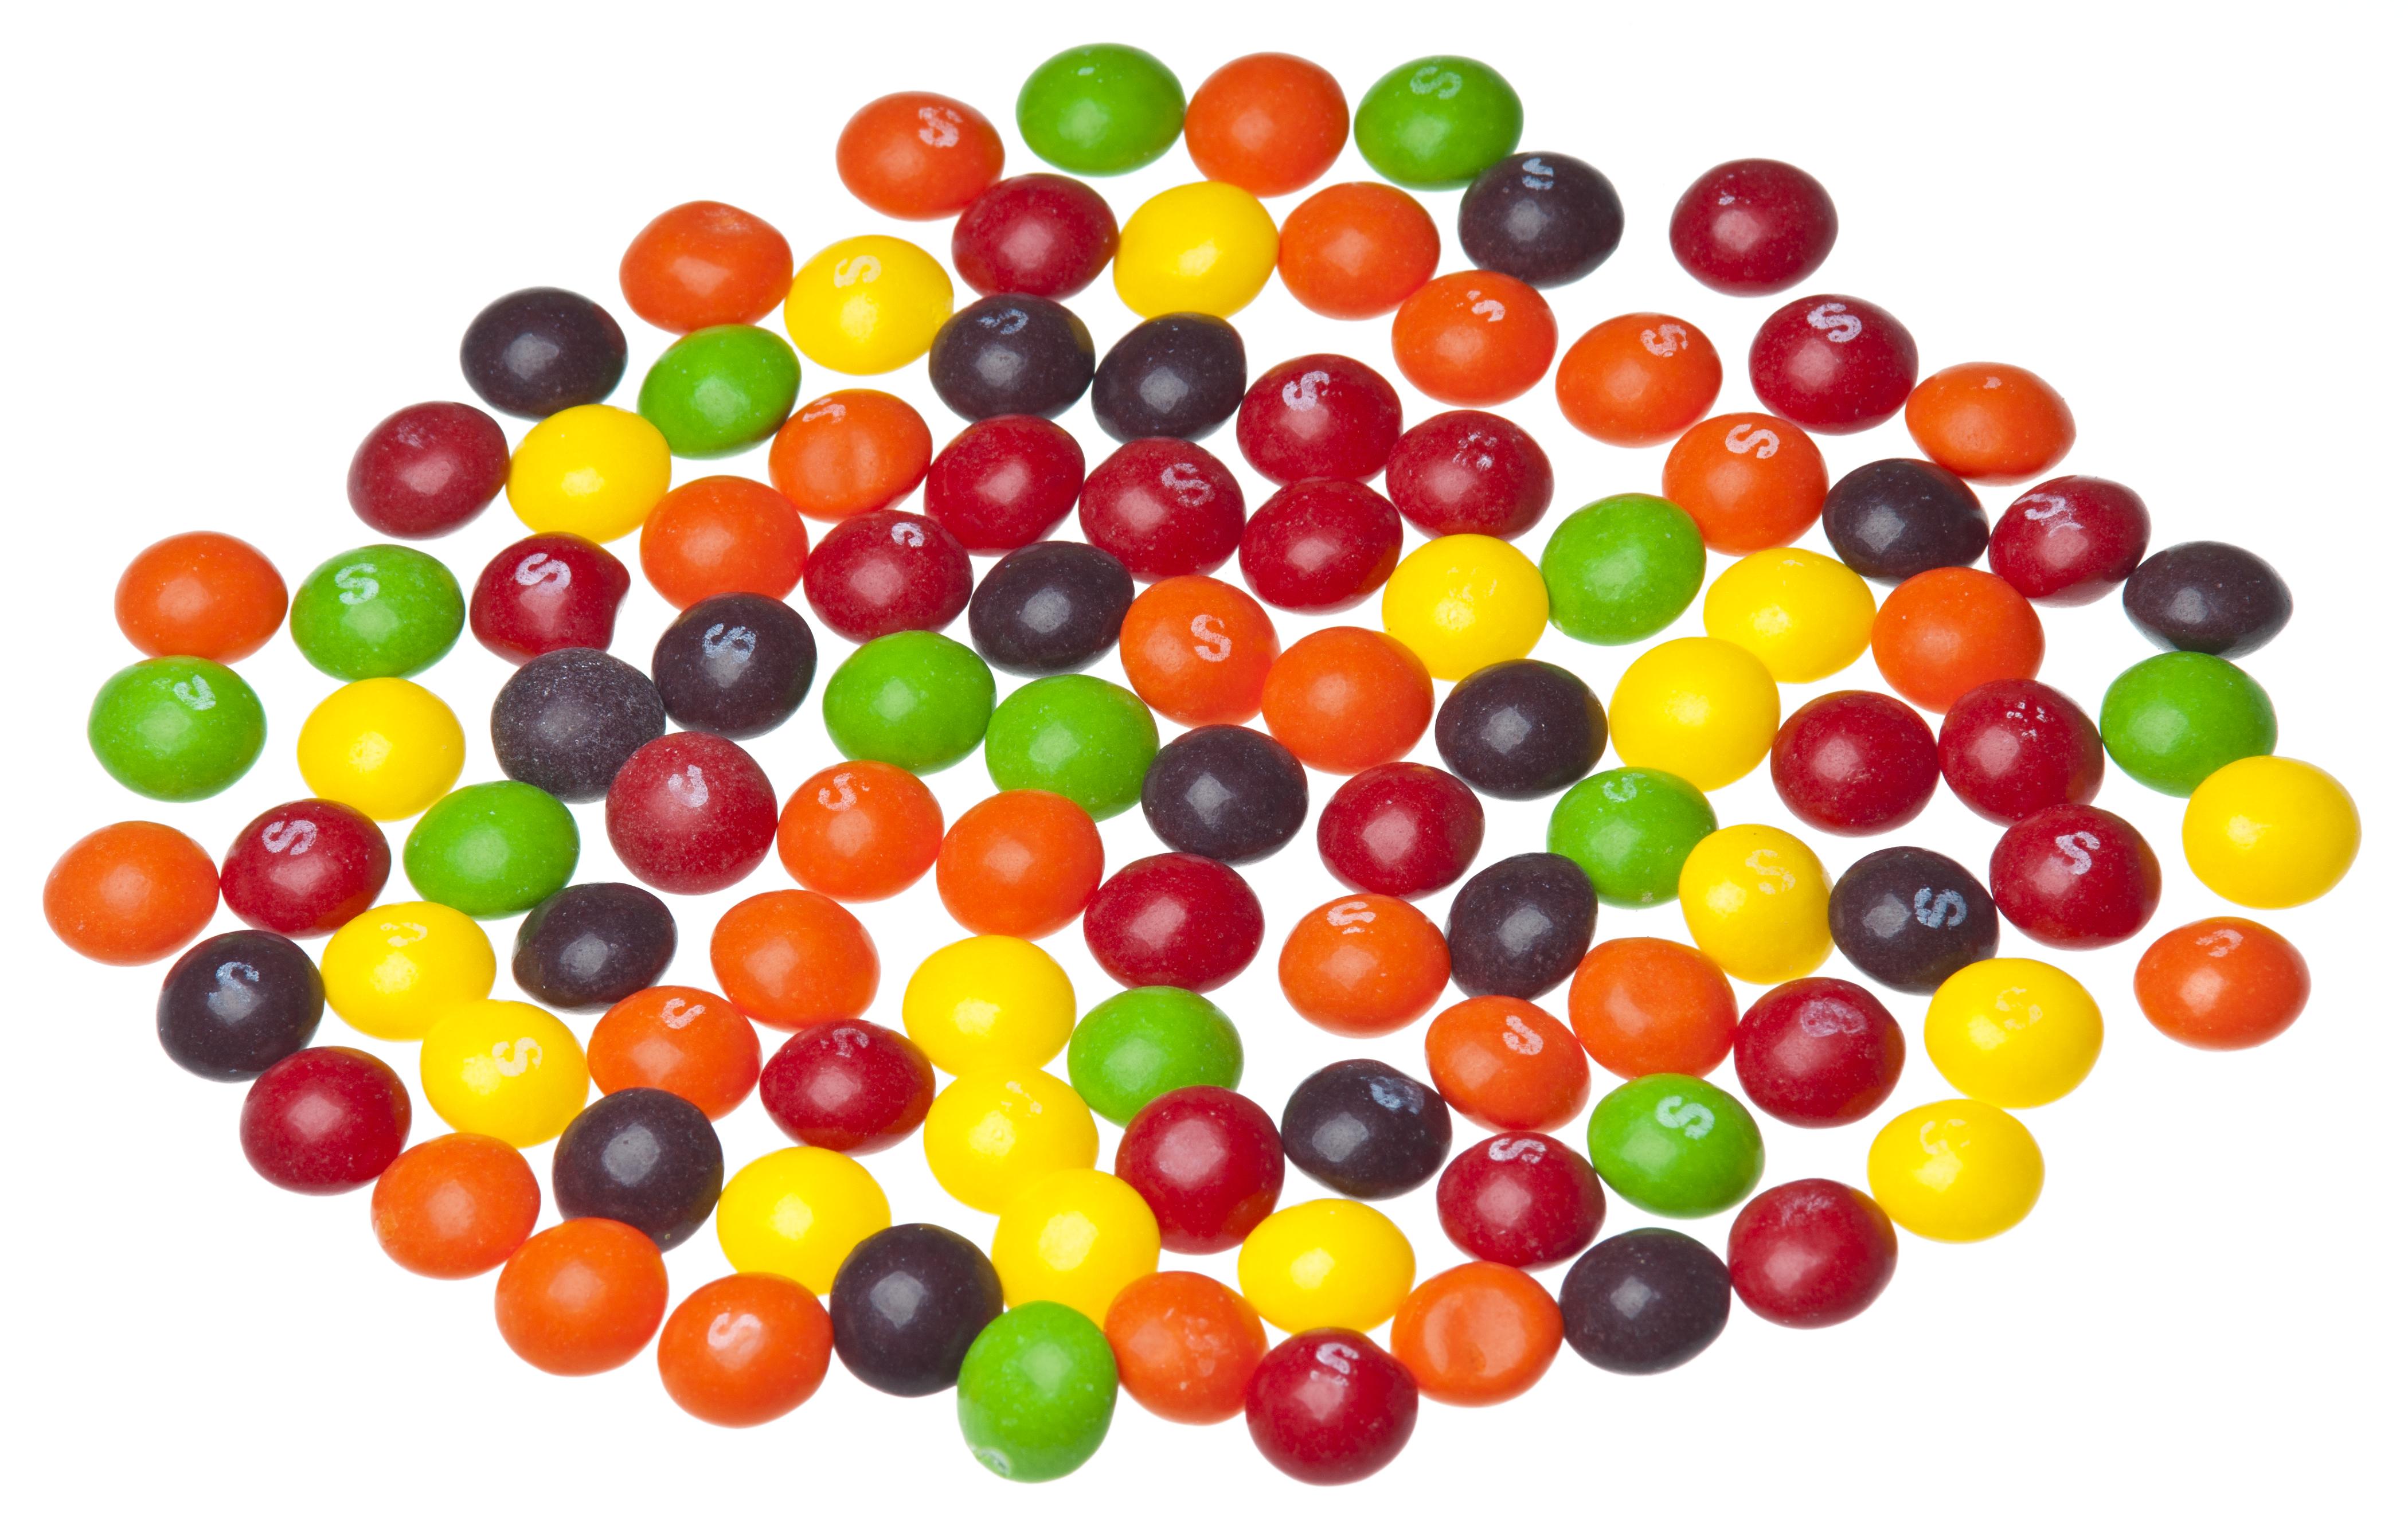 Description Skittles Candies Pile Jpg